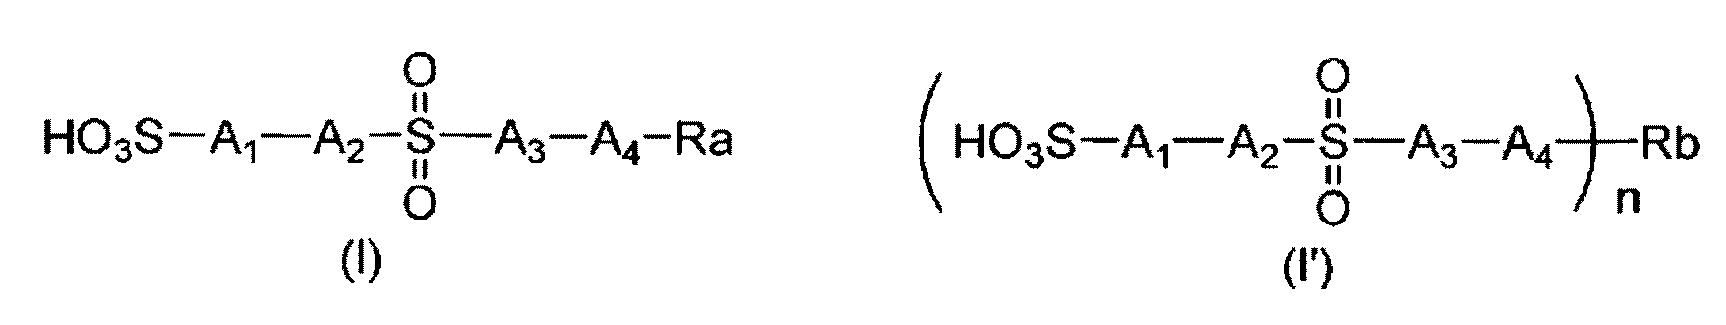 Figure 112011039817284-pct00058